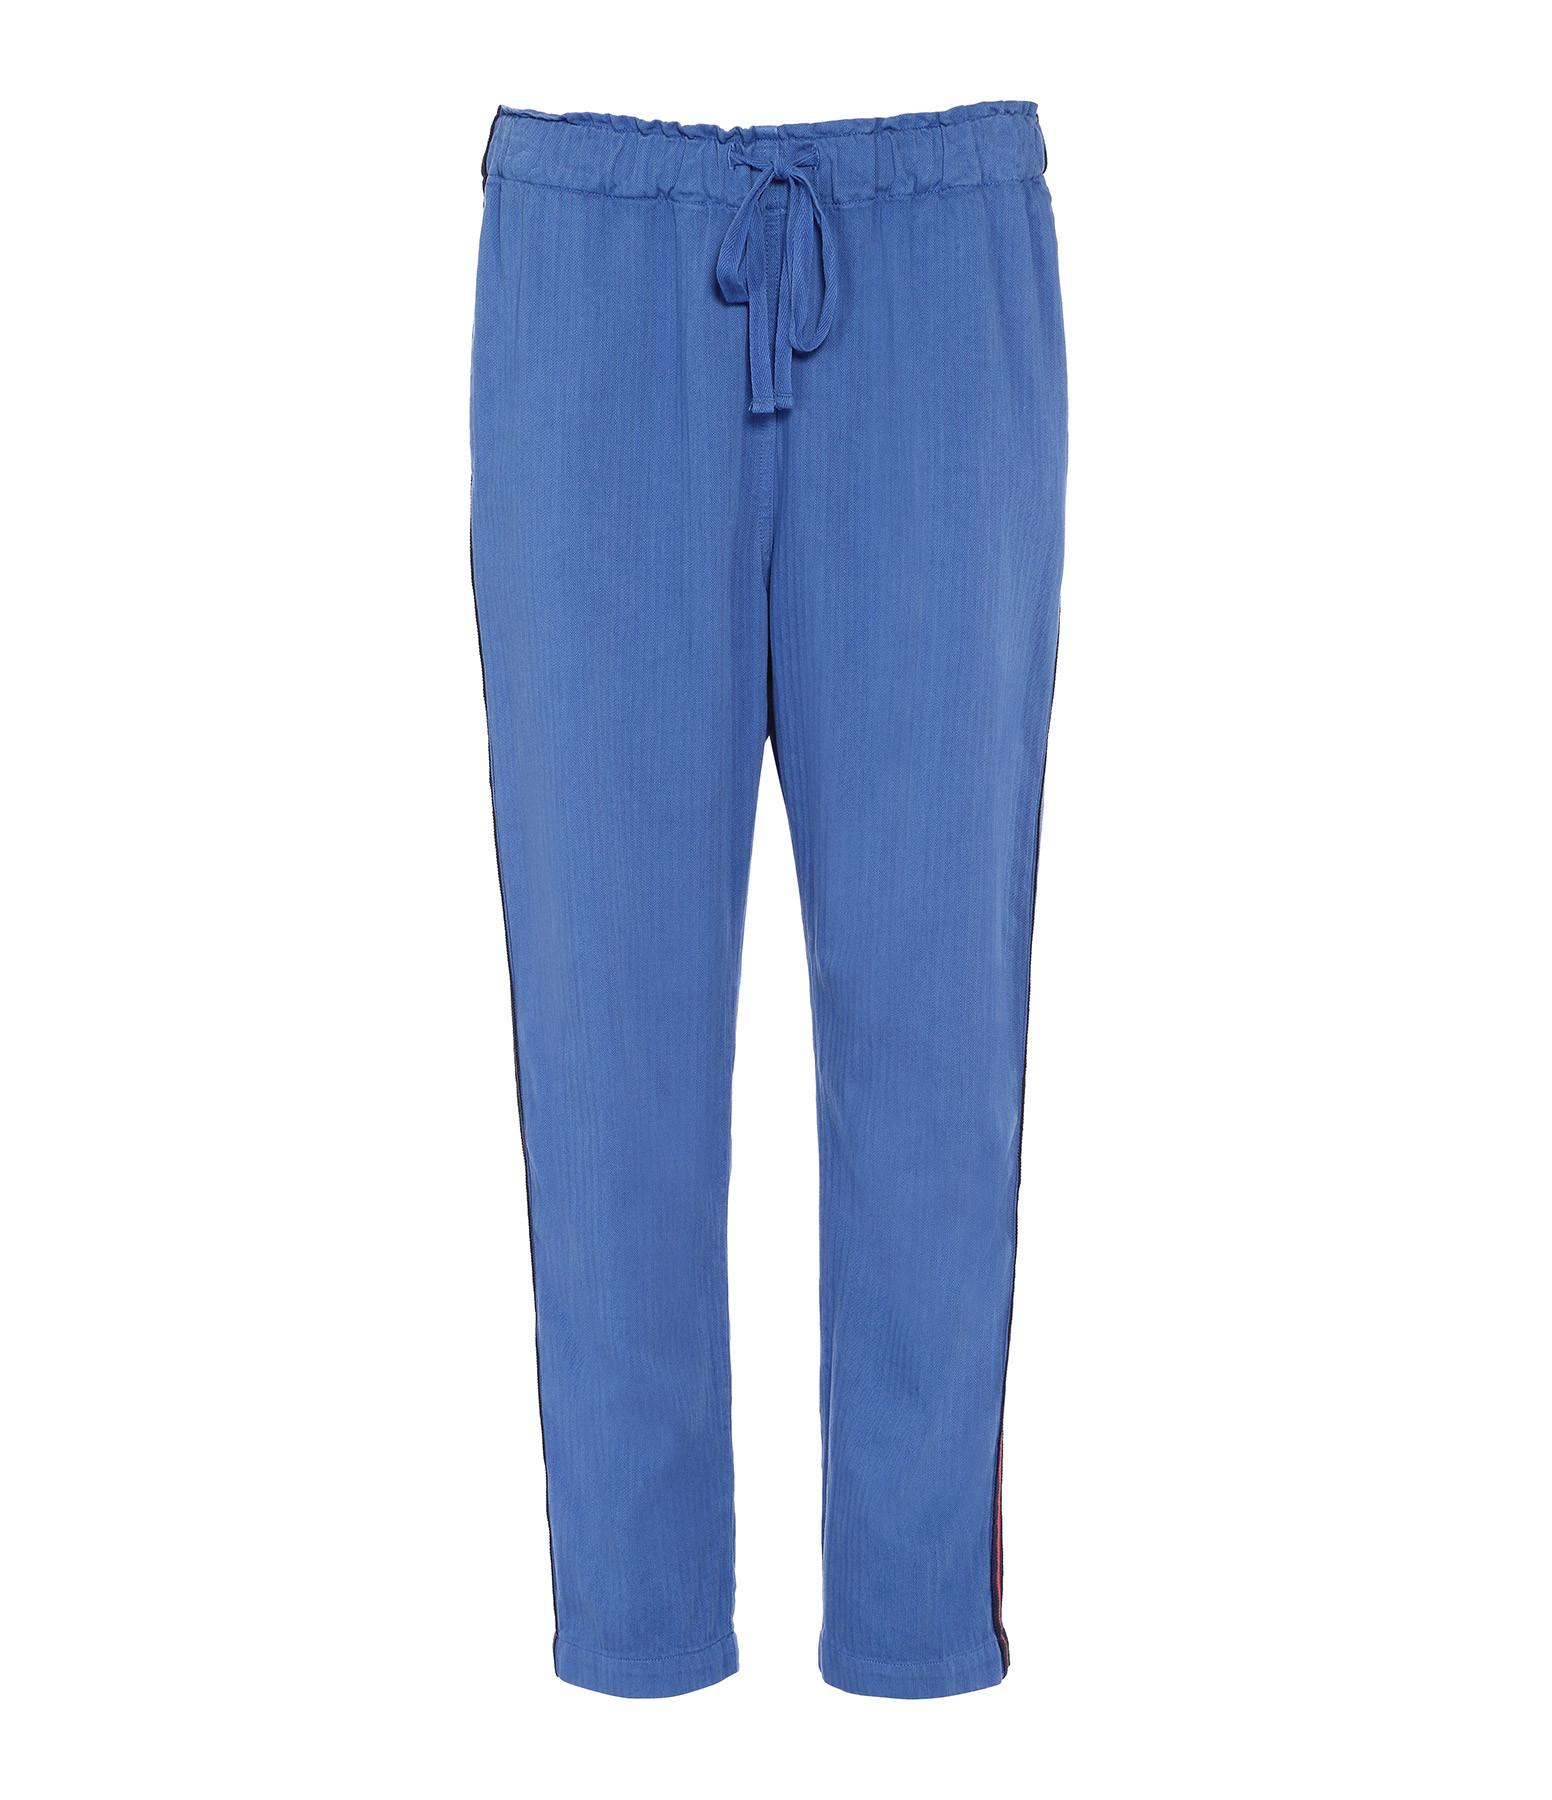 XIRENA - Pantalon Rex Bleu Ocean